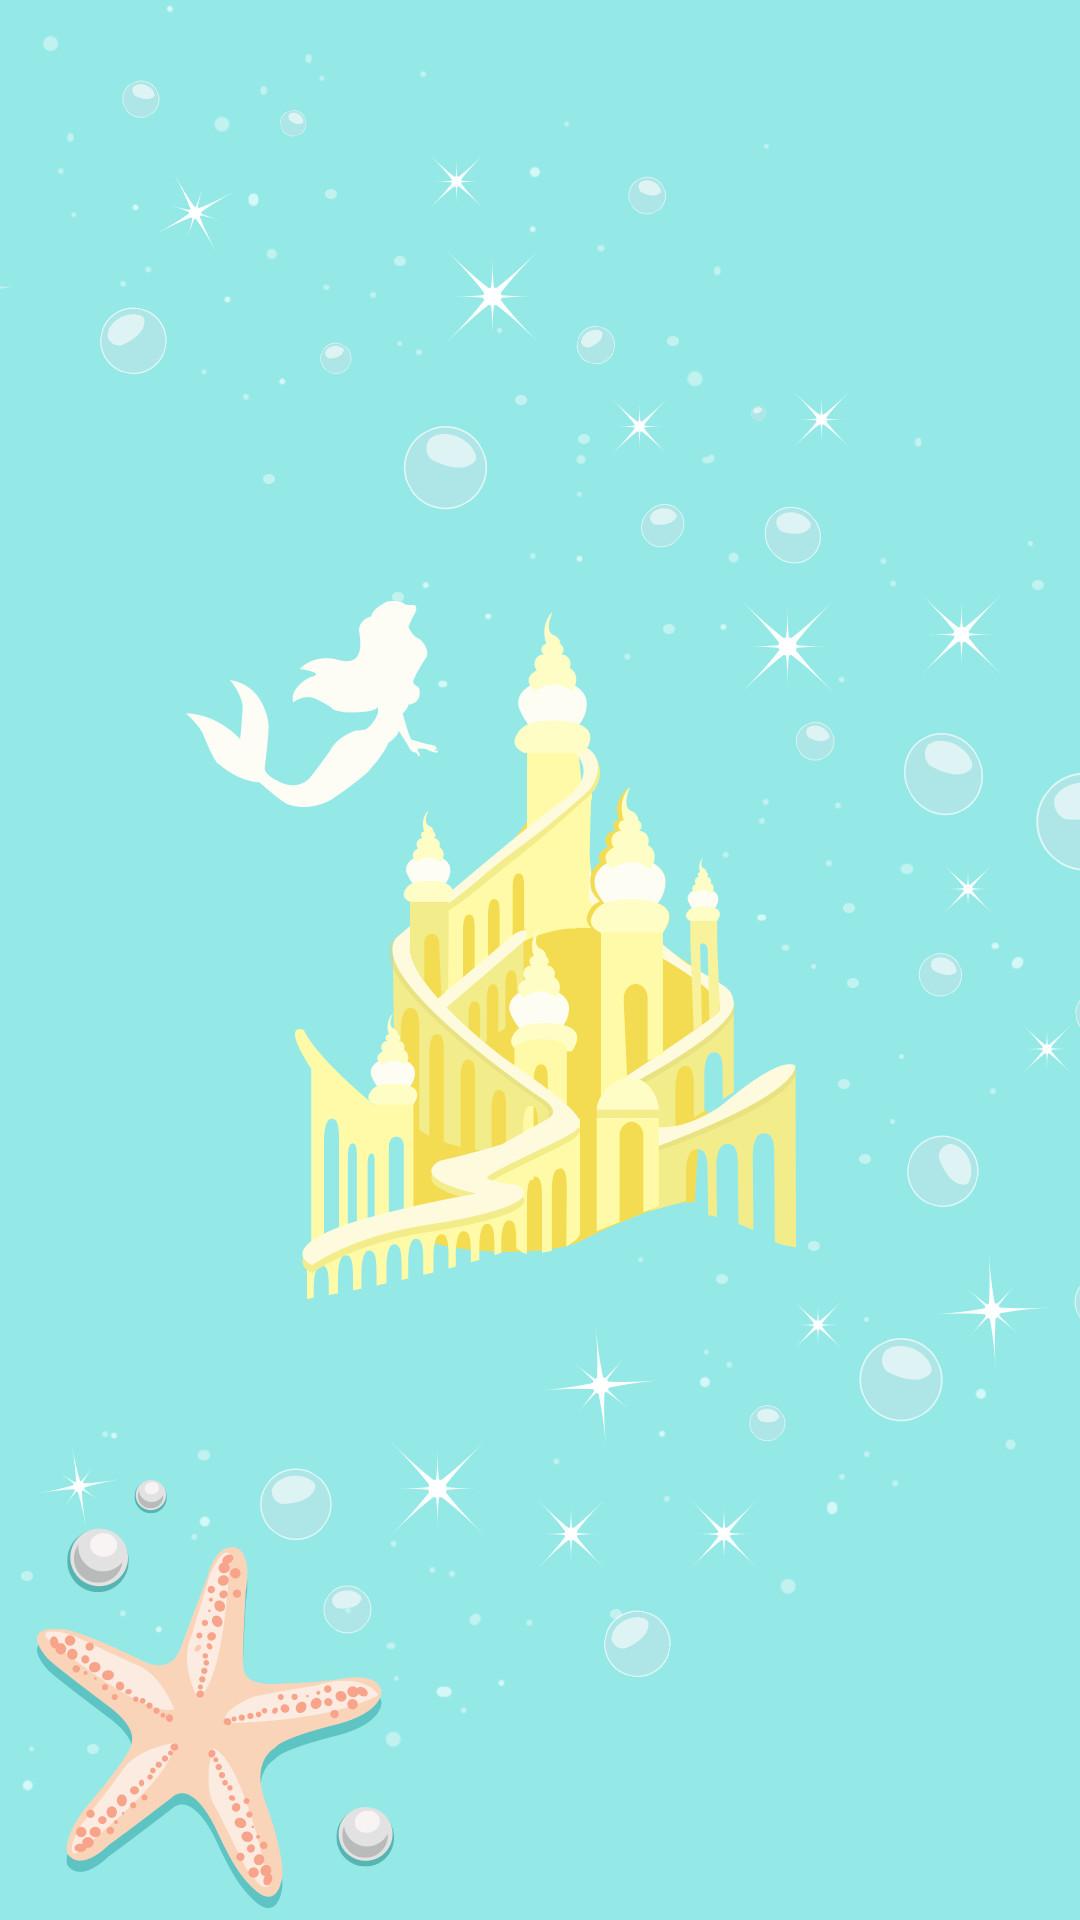 iPhone Wallpaper – Disney tjn. iPhone Wall tjn